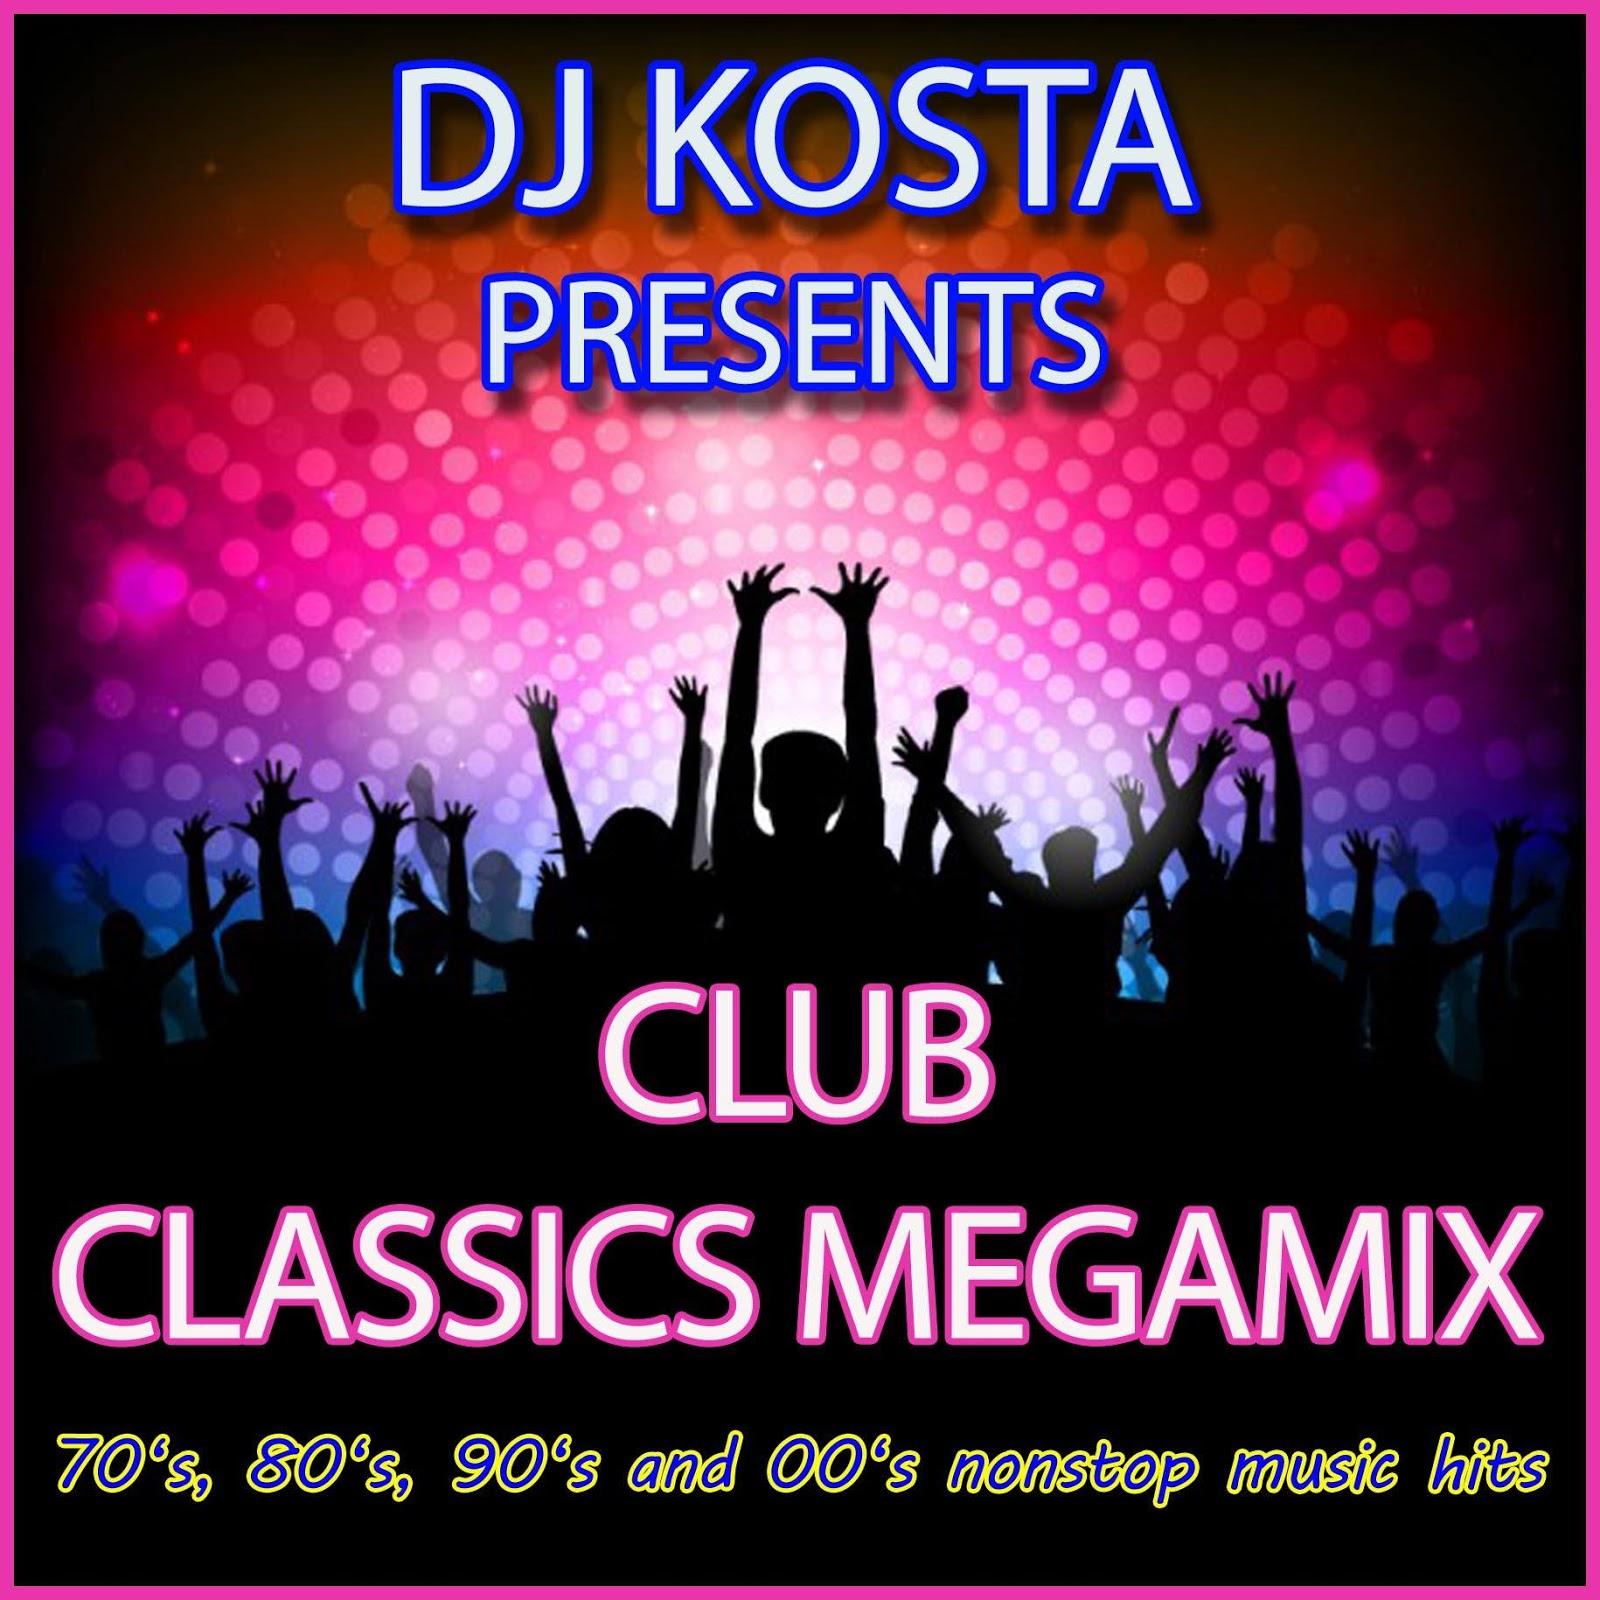 DJ Kosta - CLUB CLASSICS MEGAMIX (78:23) ~ THE MIXTAPE WORLD